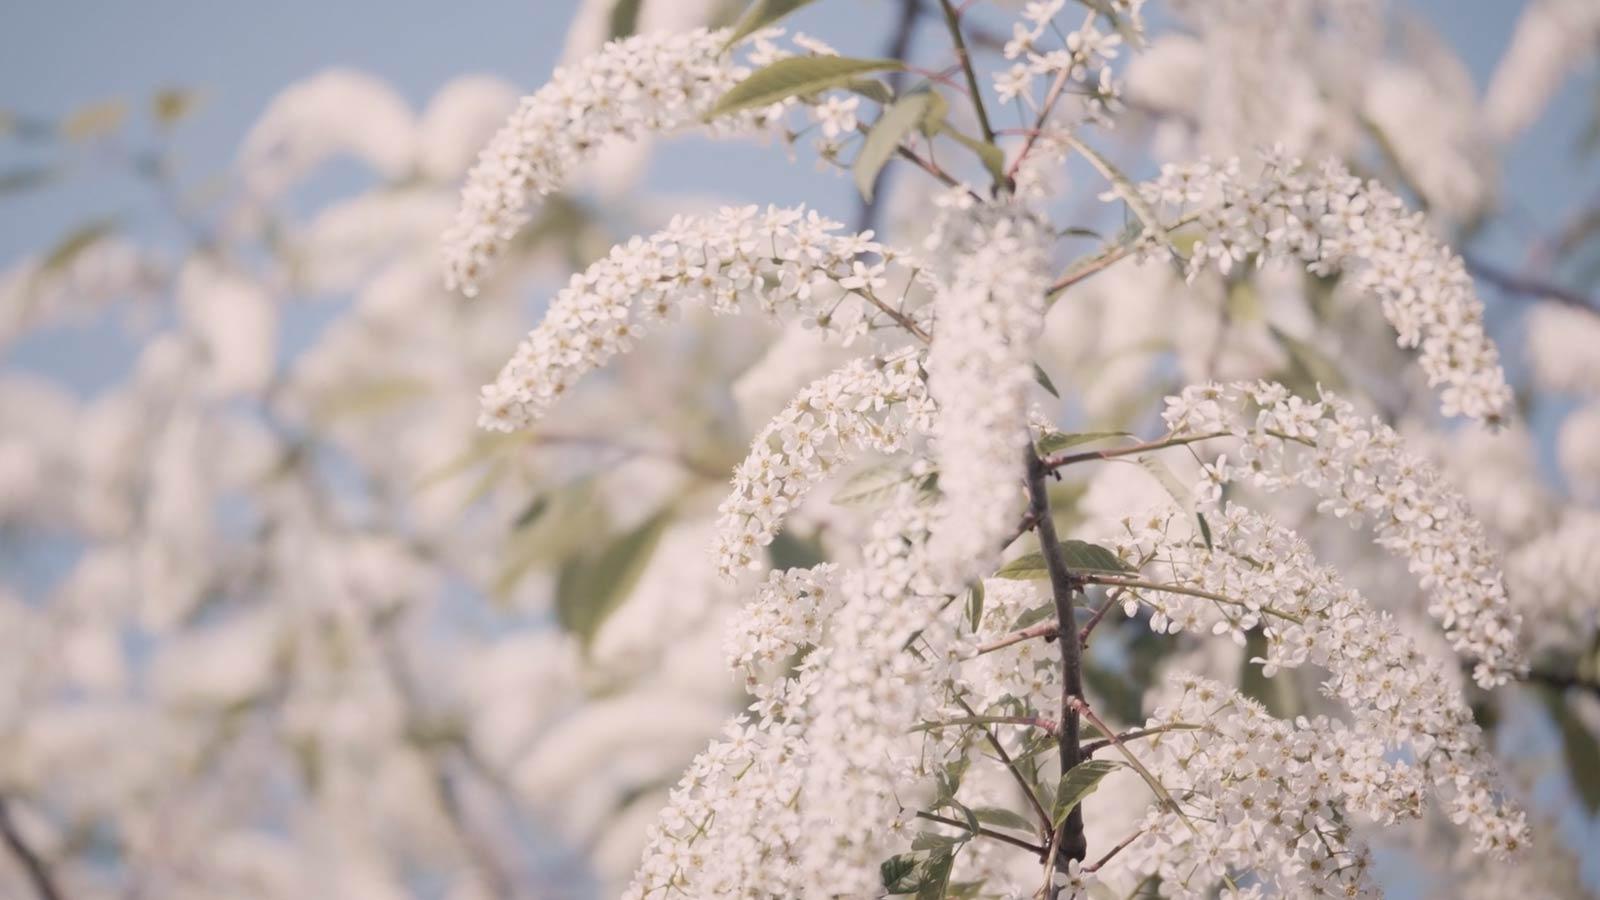 Regents Park Travel Video